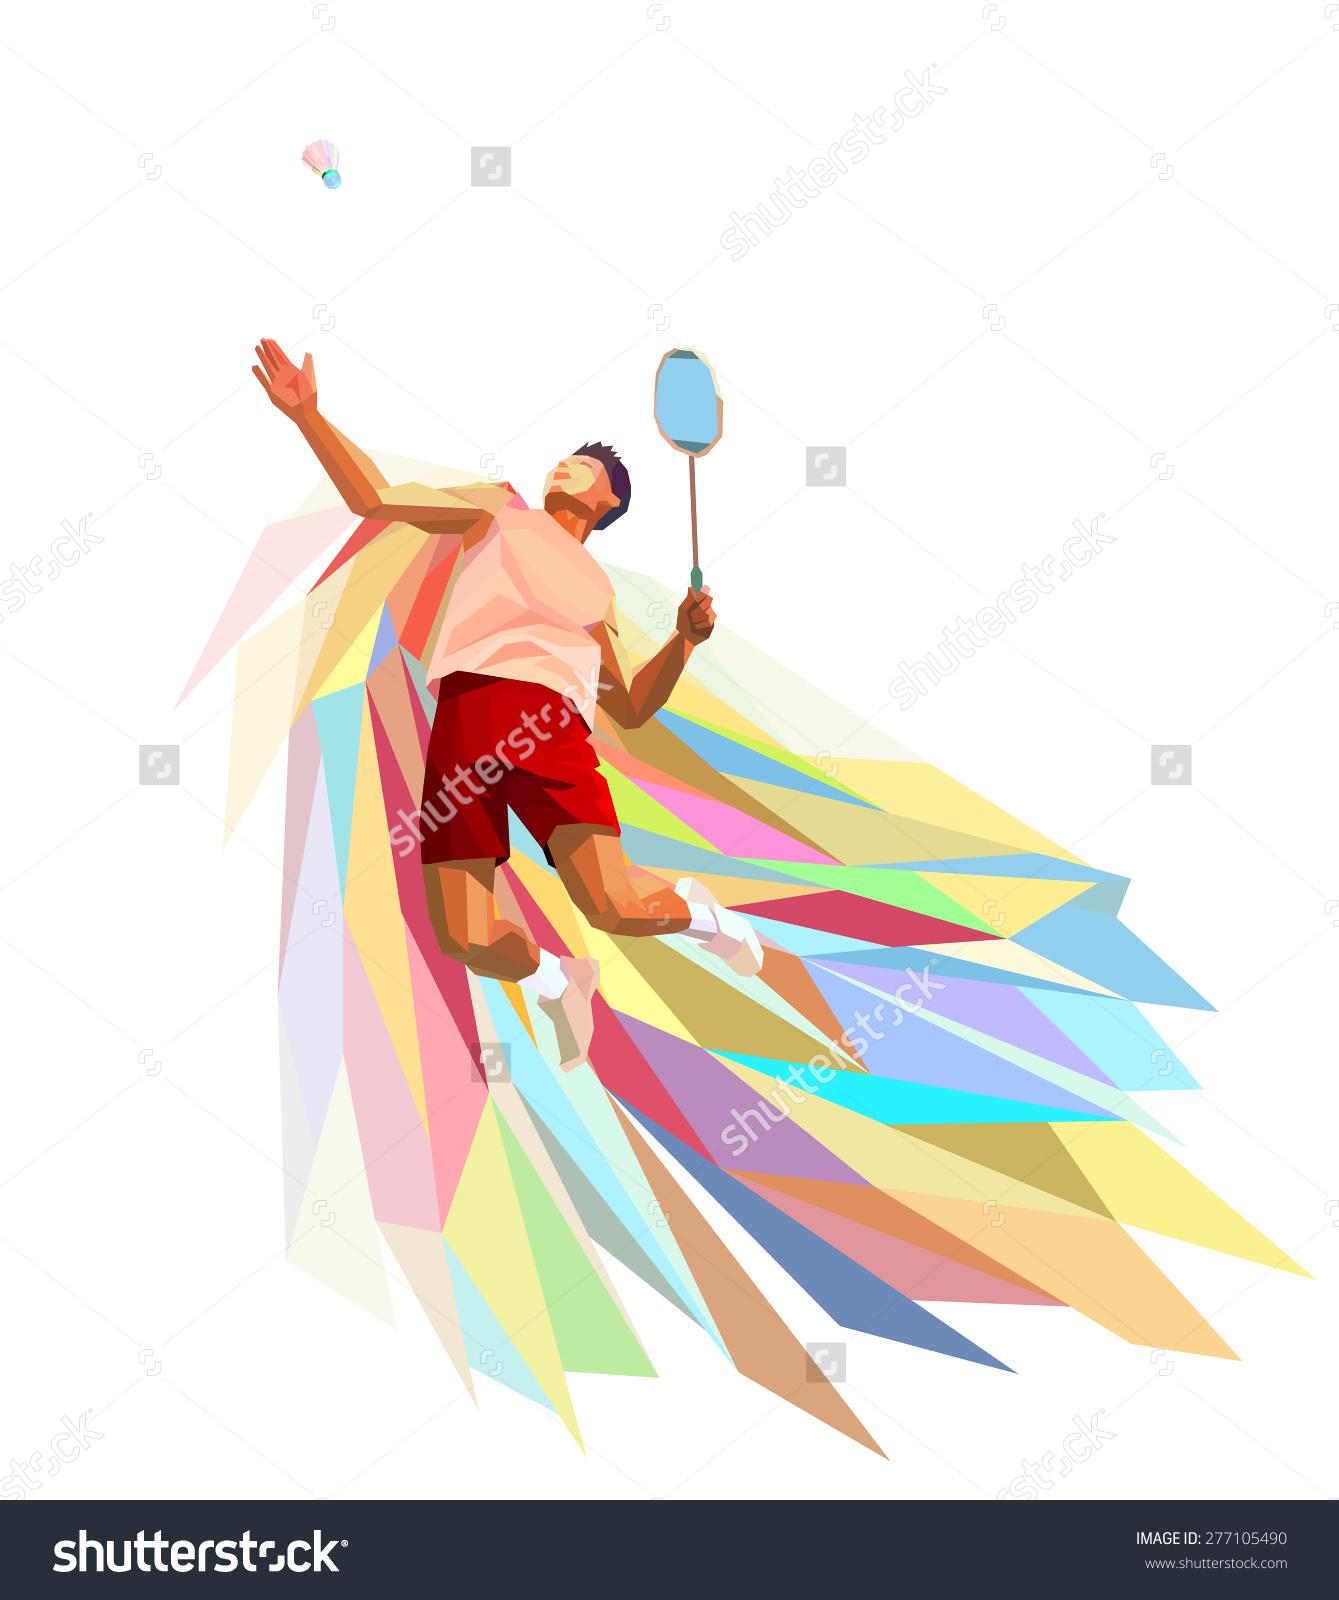 Badminton Smash Clipart Smash activities Badminton Badminton Sports